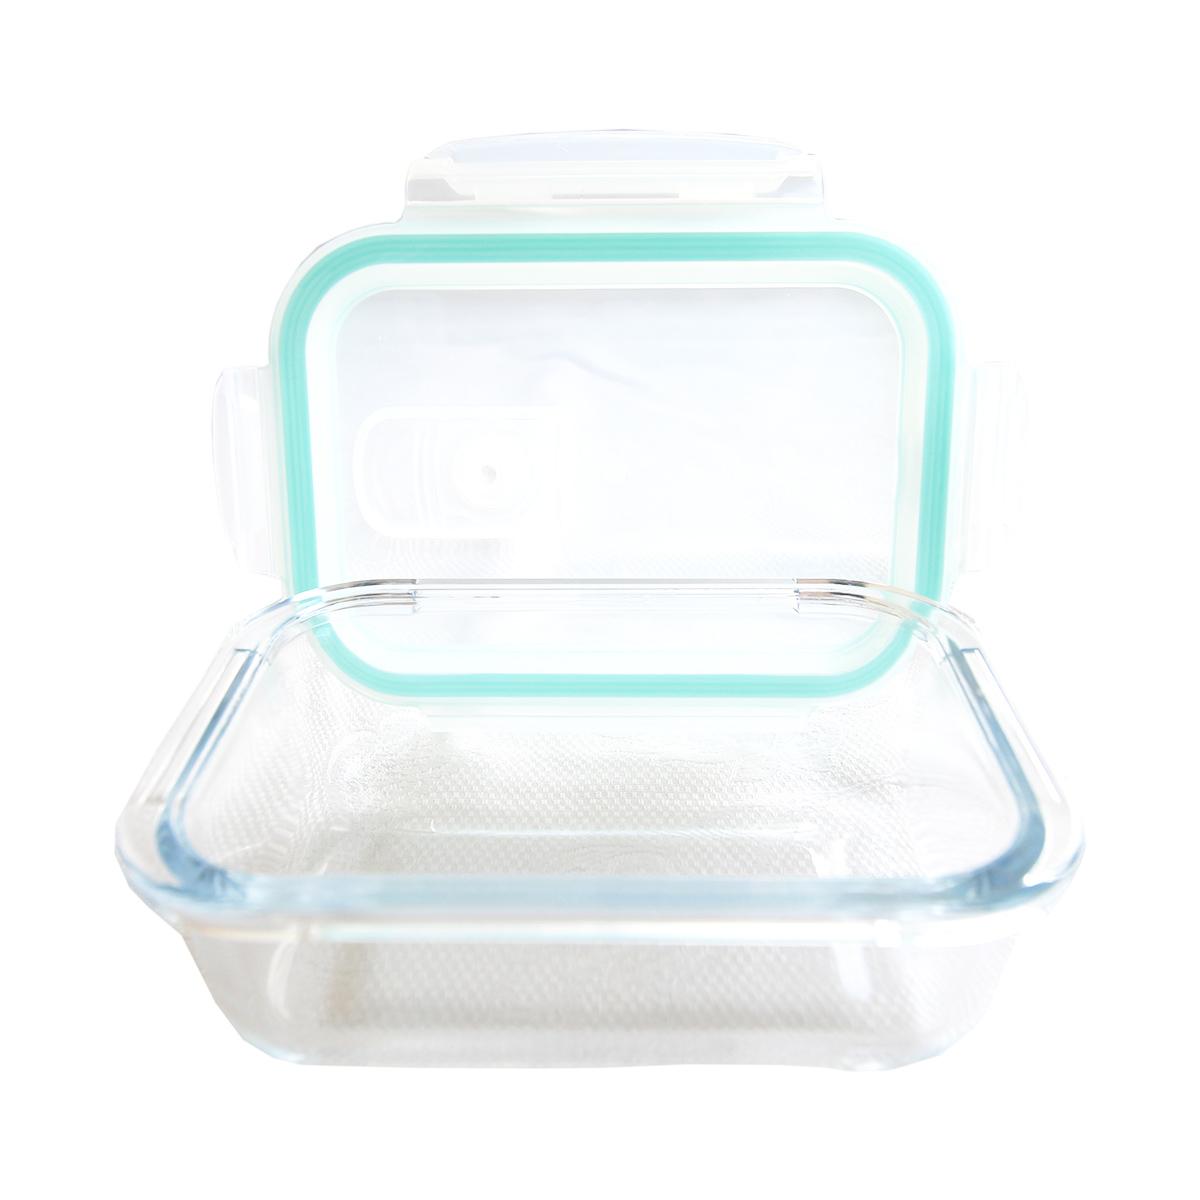 Pote hermético vidro transparente tampa plástica 1,5l Lyor